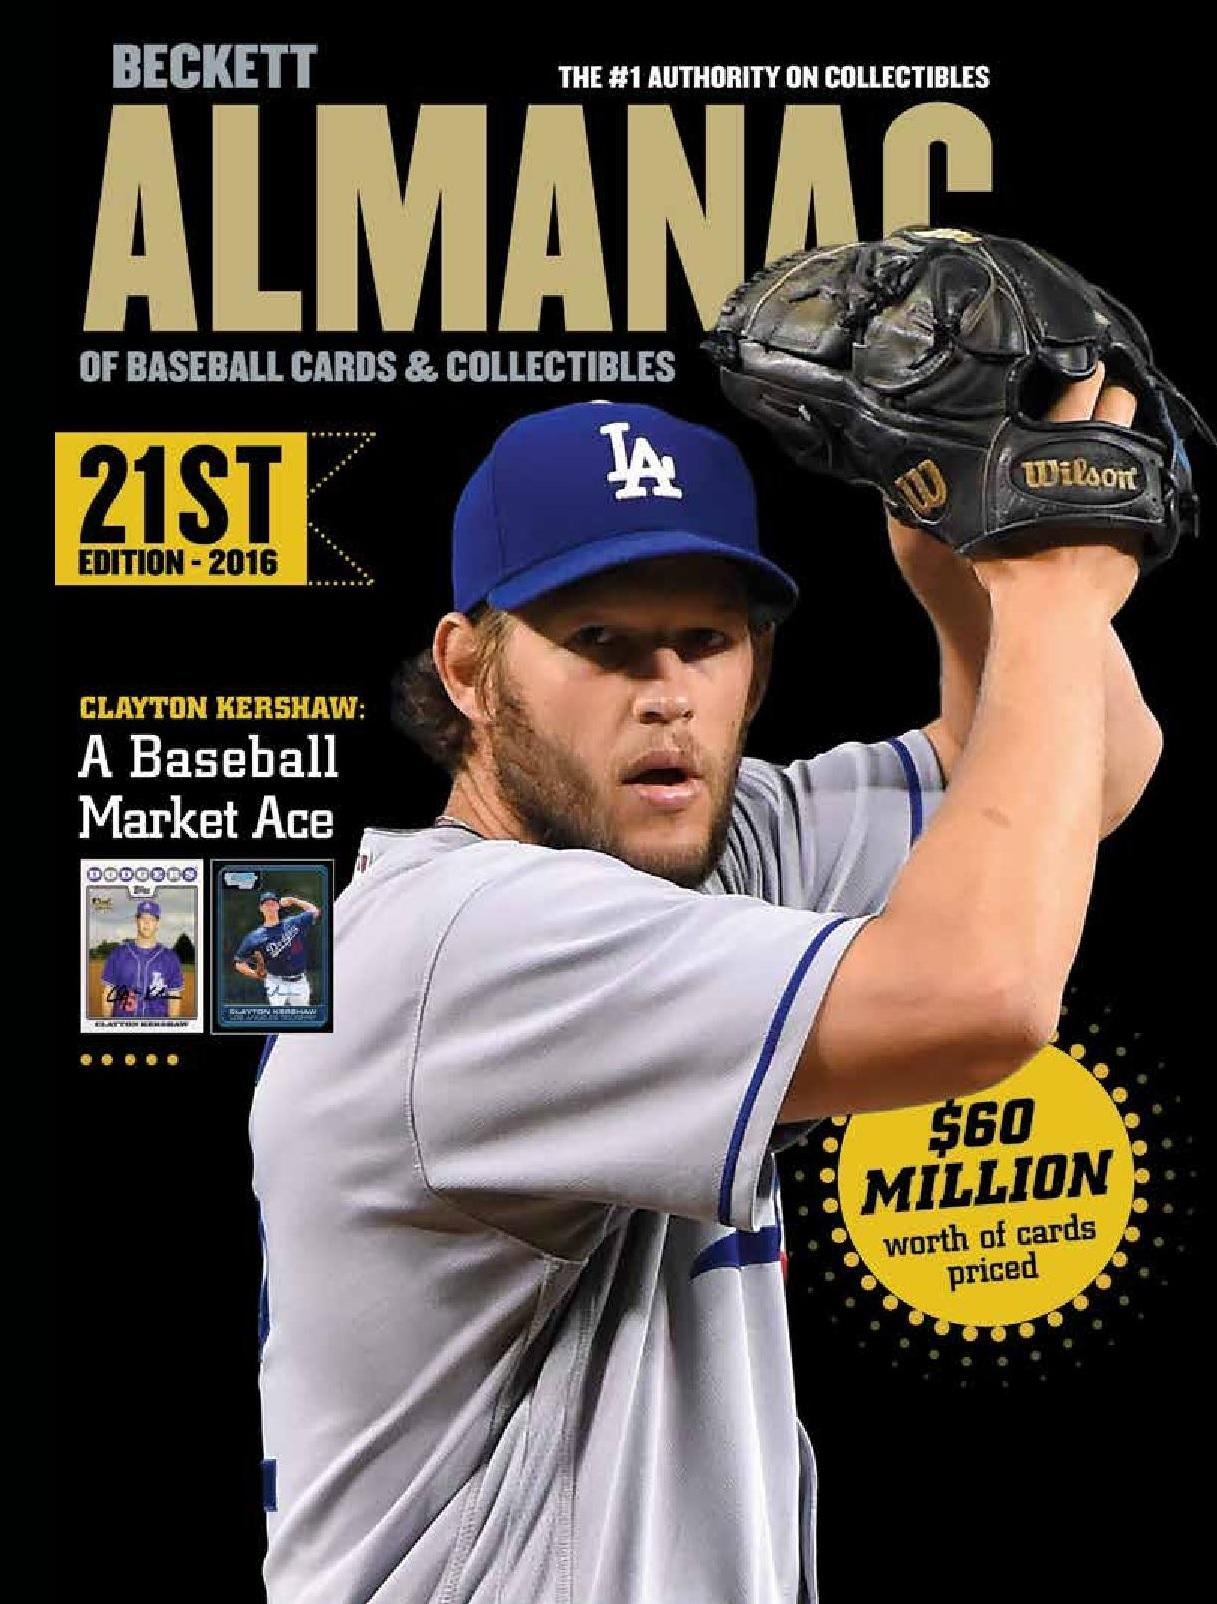 Baseball Almanac #21